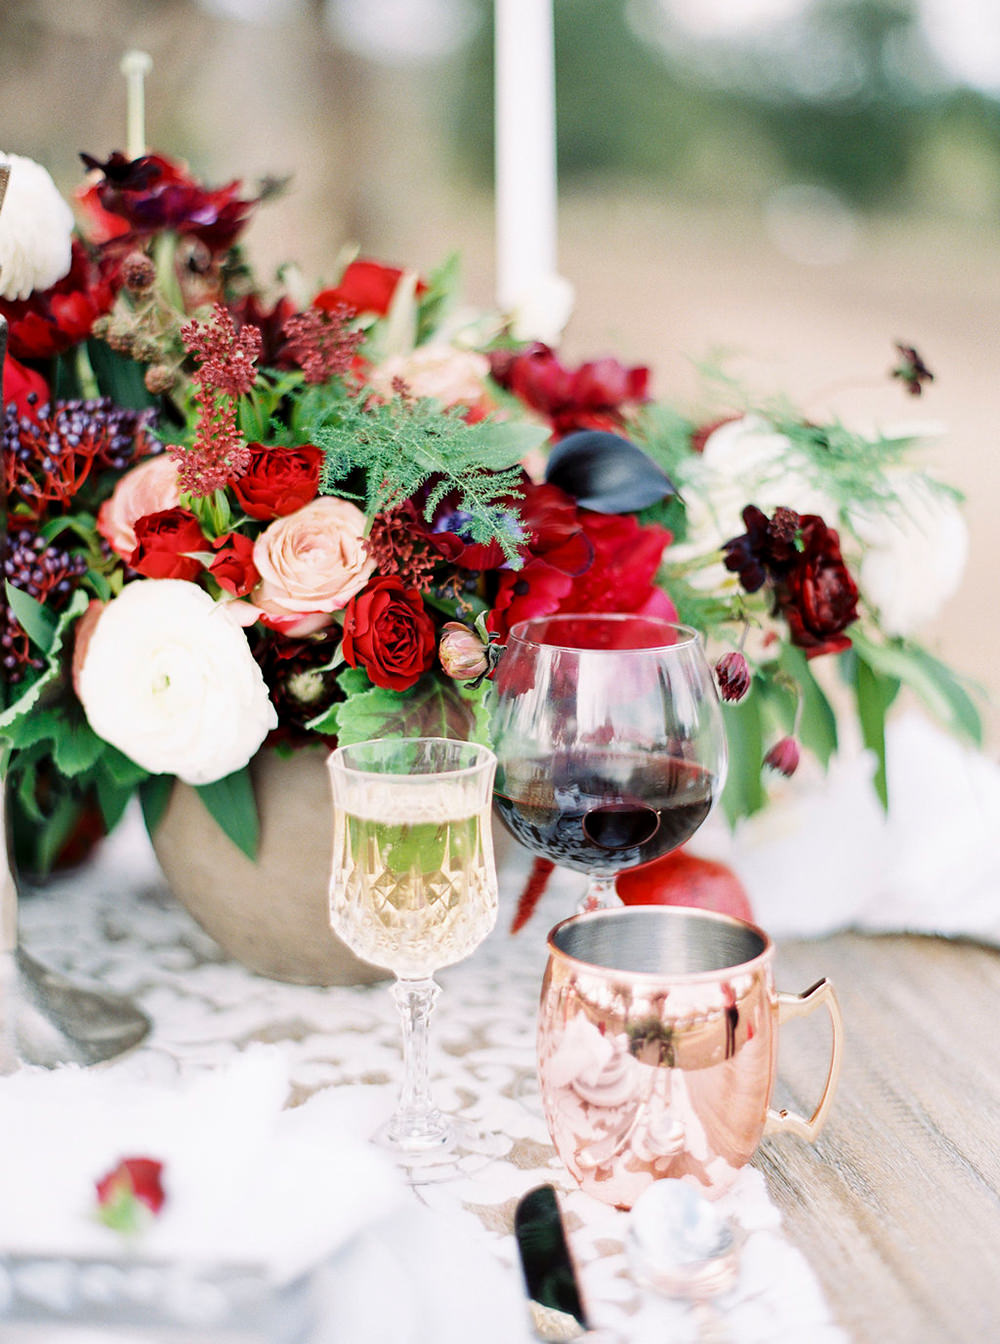 wedding tablescapes - photo by Amanda Lenhardt http://ruffledblog.com/relaxed-san-juan-capistrano-wedding-inspiration